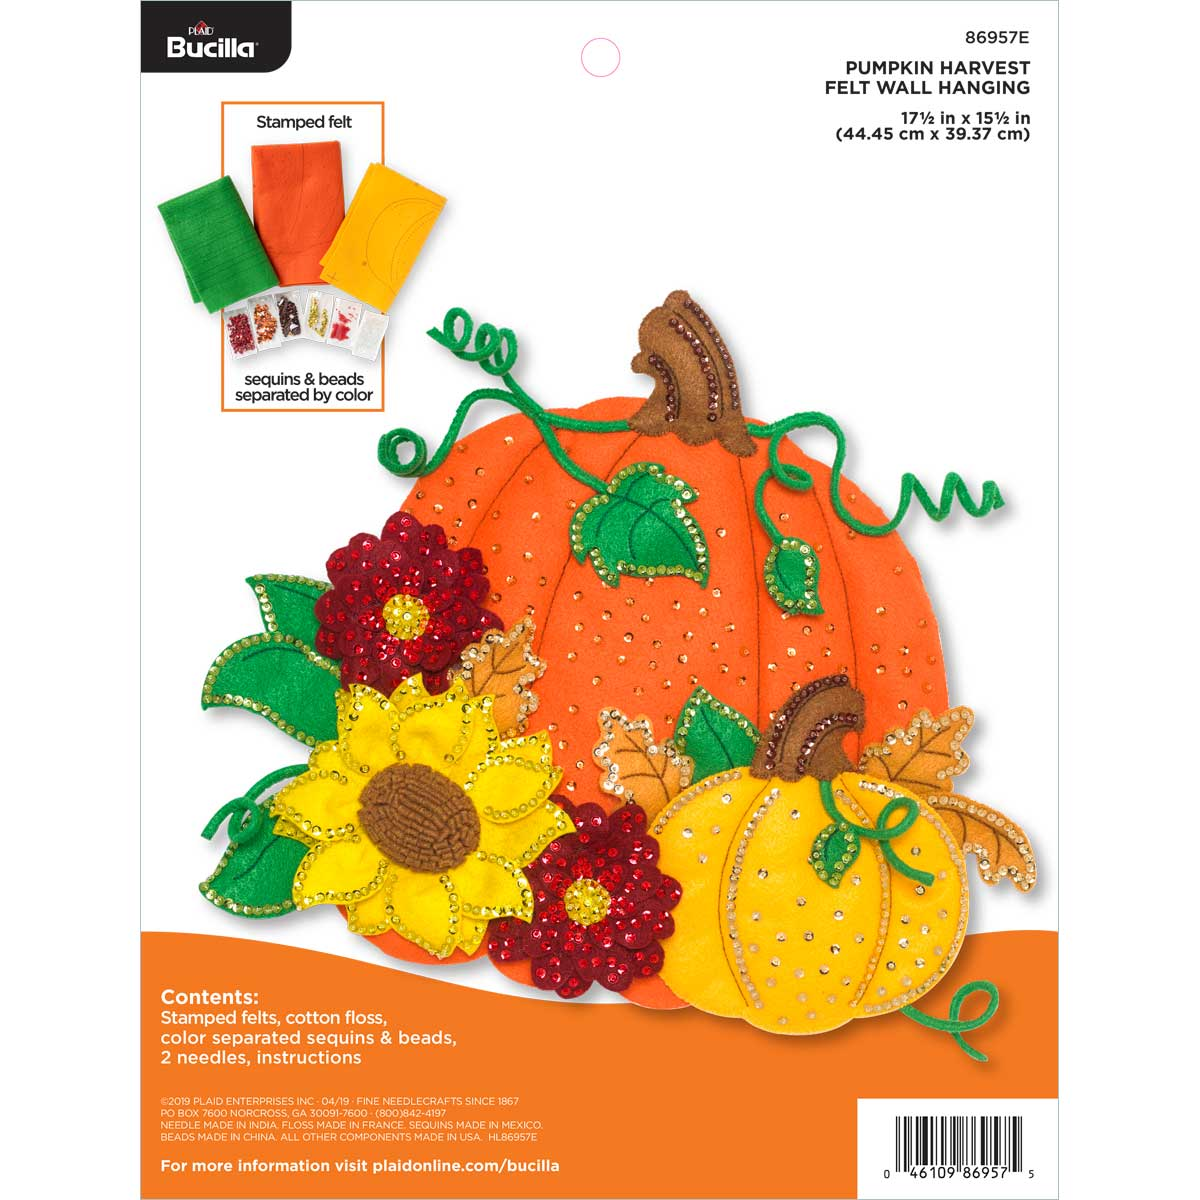 Bucilla ® Seasonal - Felt - Home Decor - Pumpkin Harvest Wall Hanging - 86957E